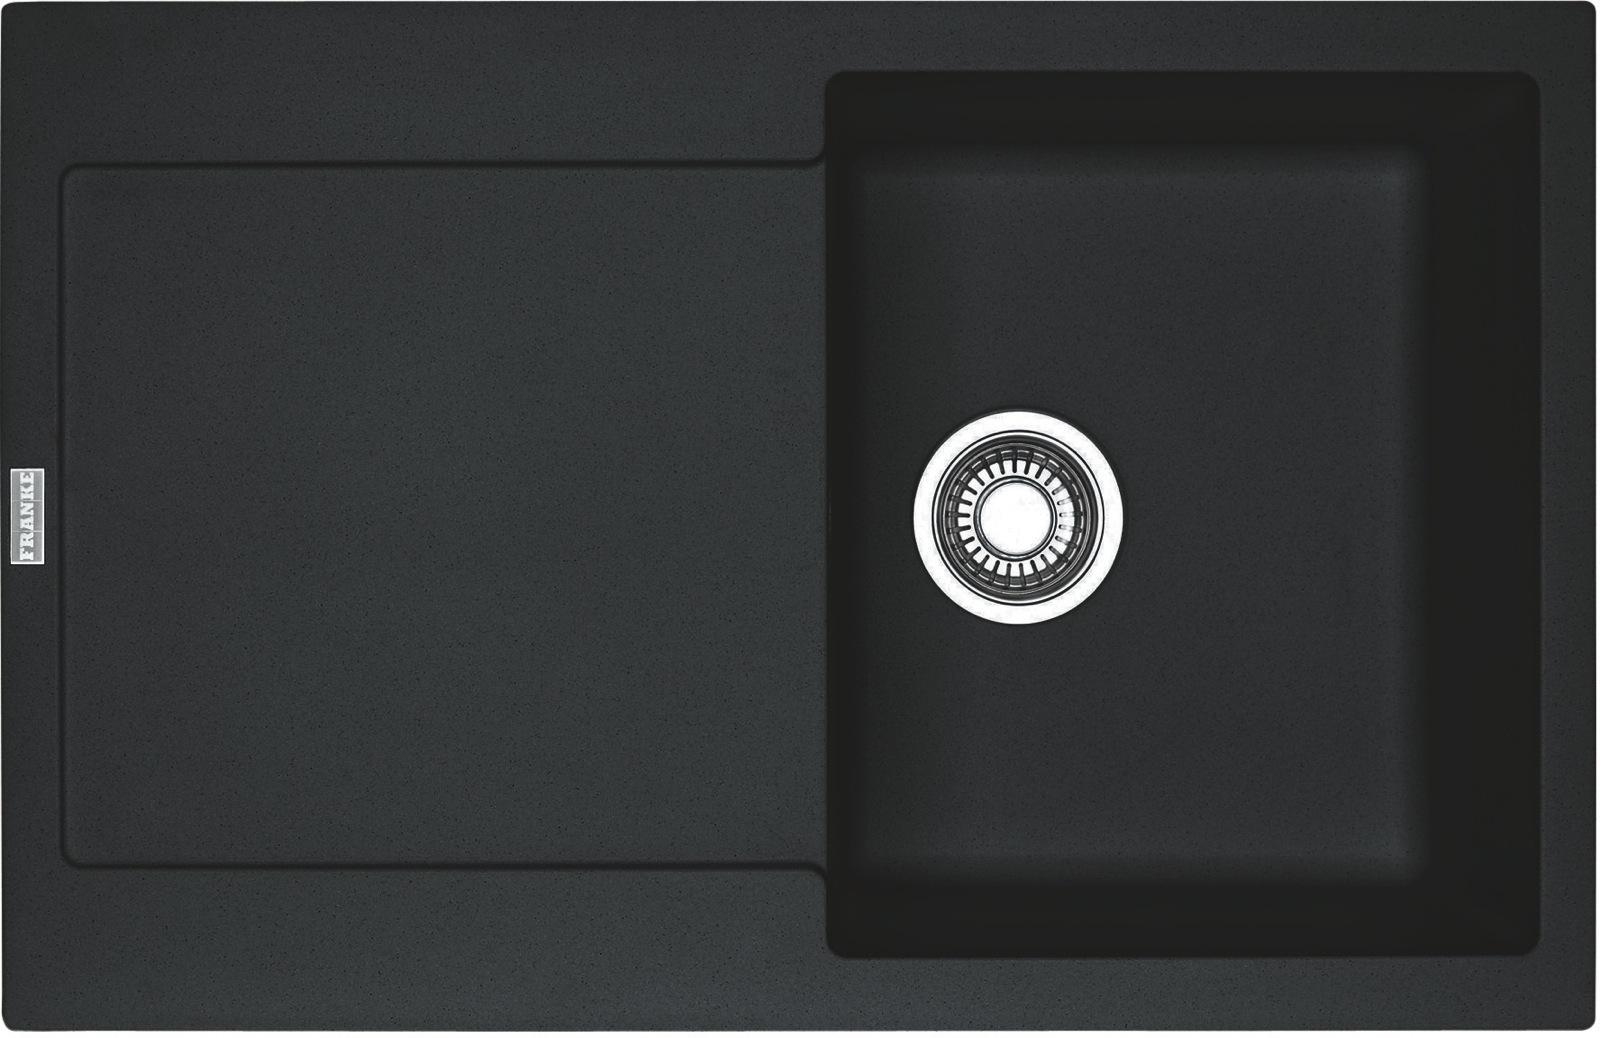 Chiuveta bucatarie fragranite Franke Maris MRG 611 reversibila 780x500mm tehnologie Sanitized Nero